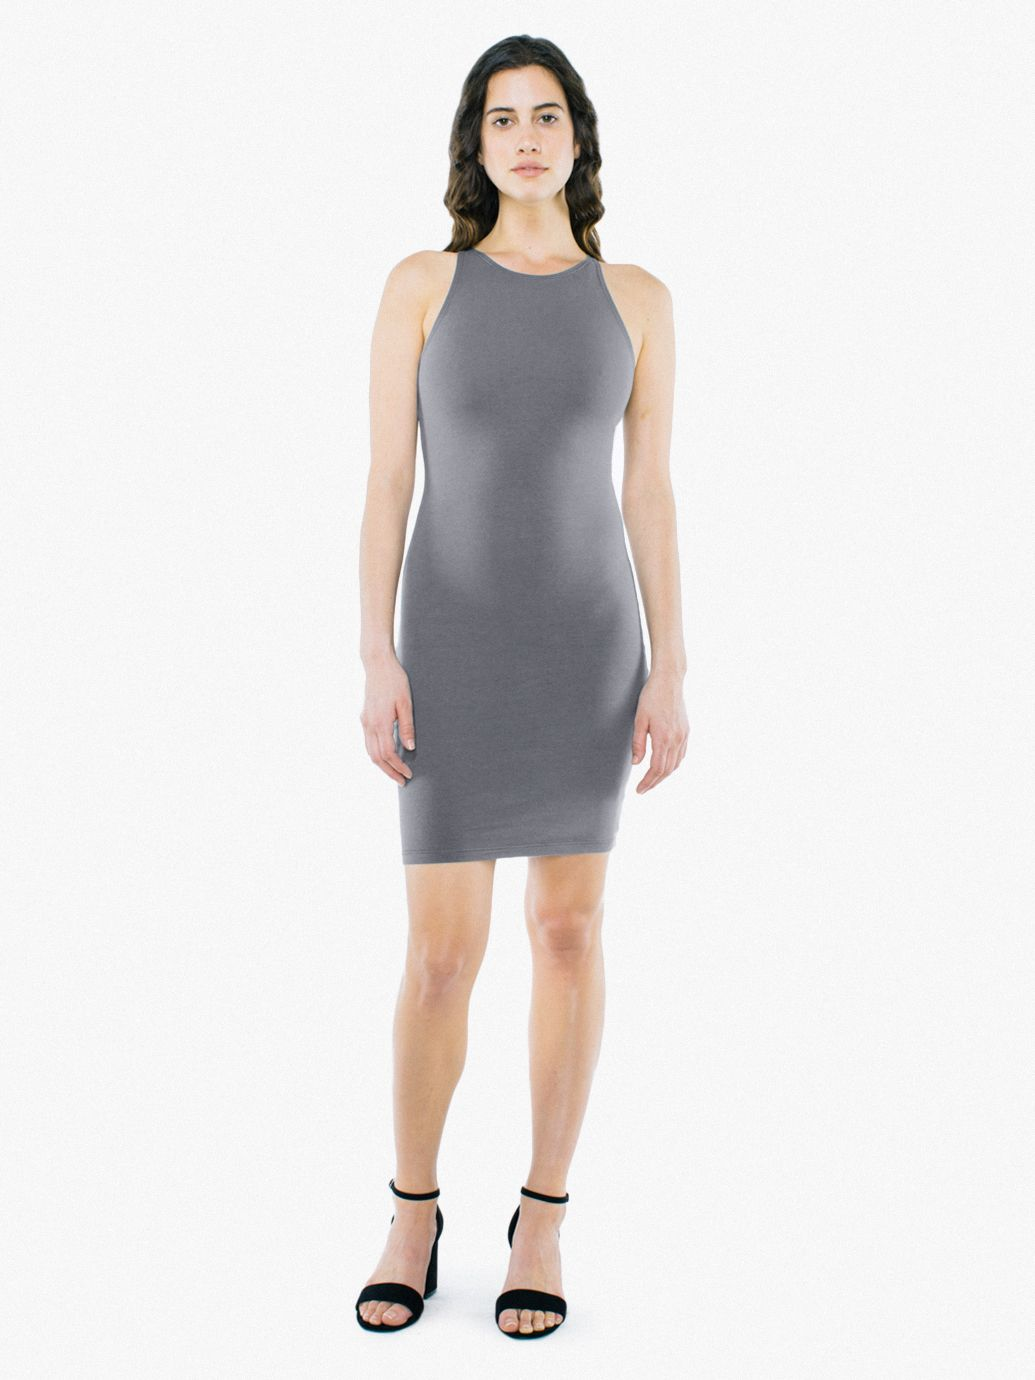 Spandex Cocktail Dresses